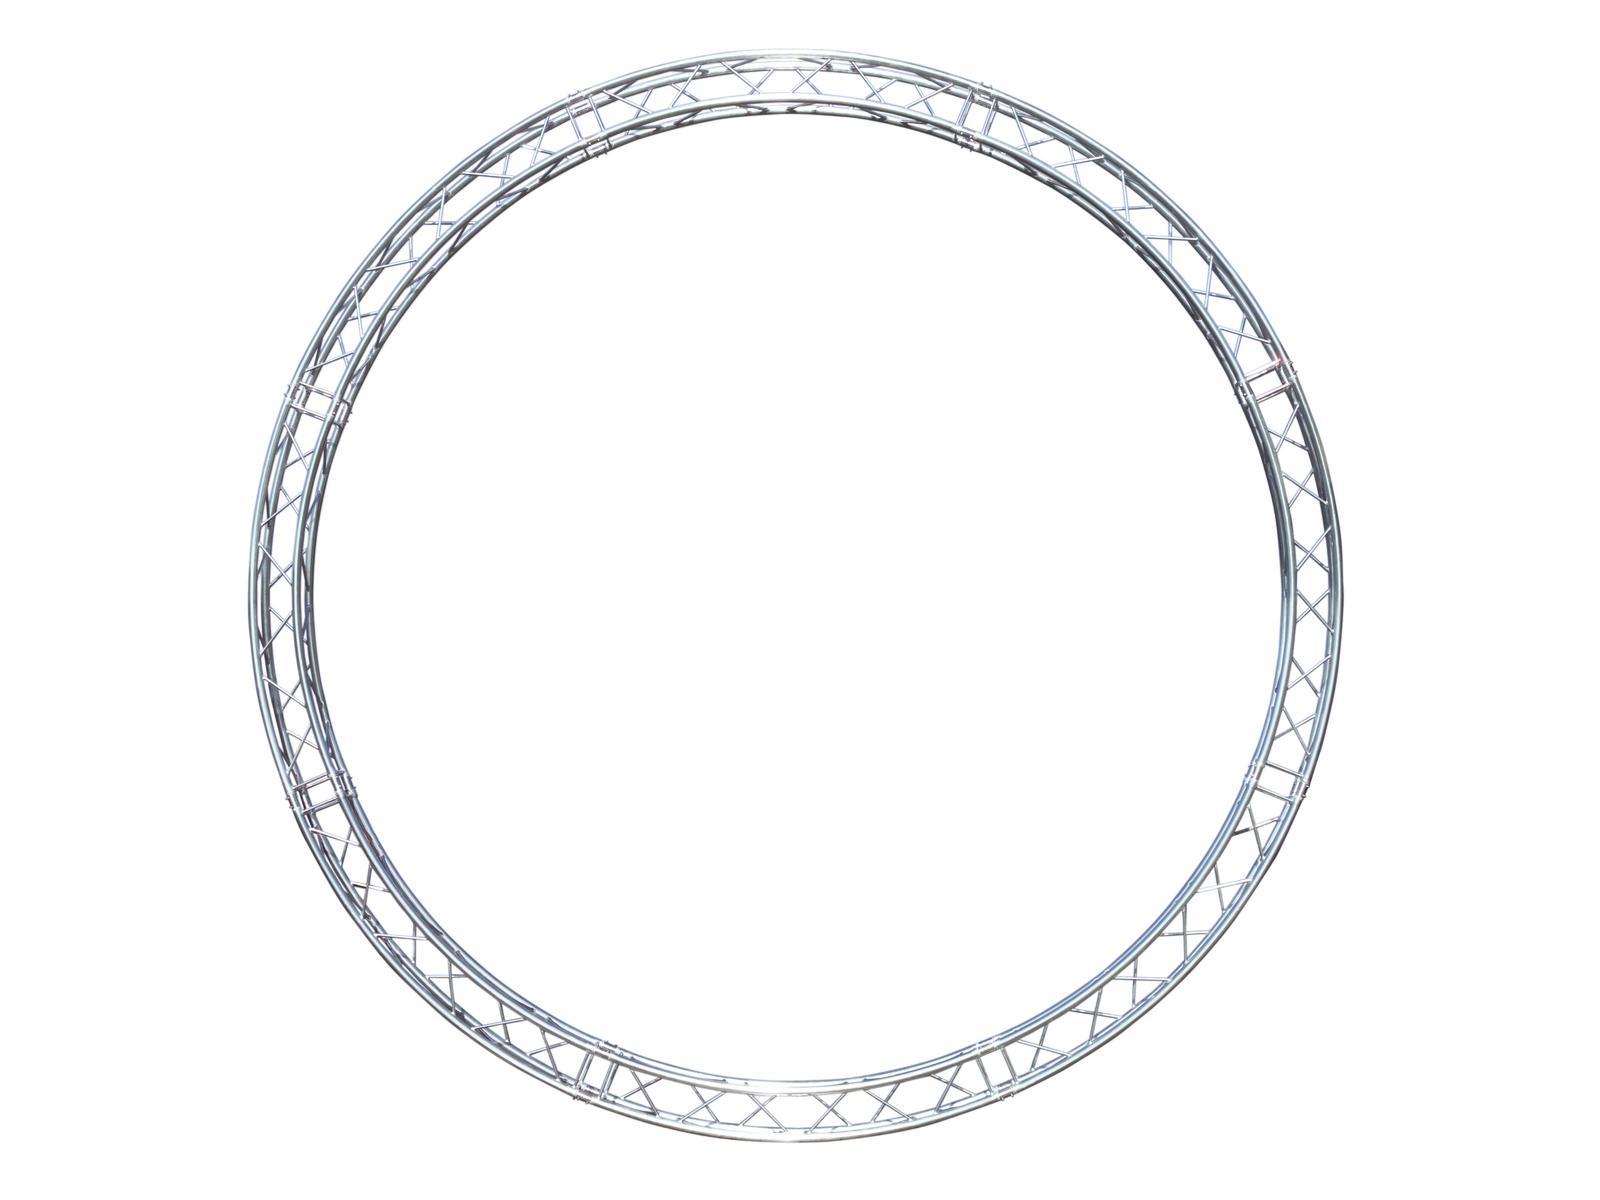 ALUTRUSS QUADLOCK 6082 cerchio d=4m (all'interno)